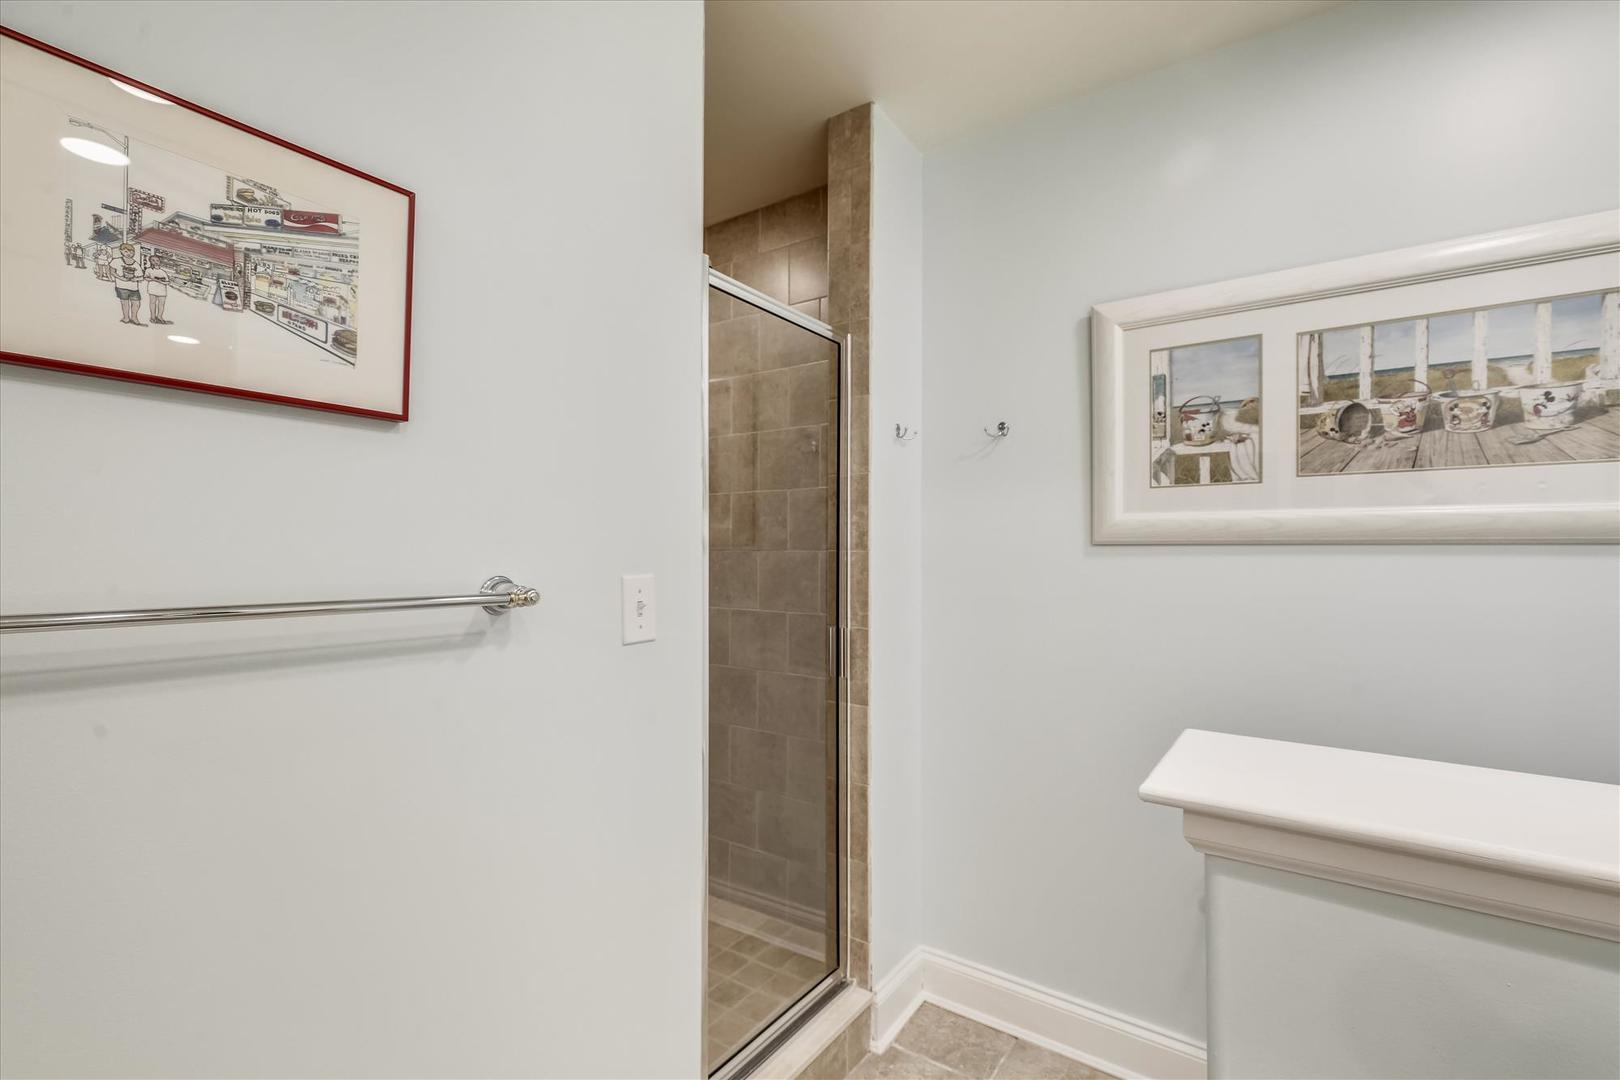 South Beach 304 - Bathroom 3